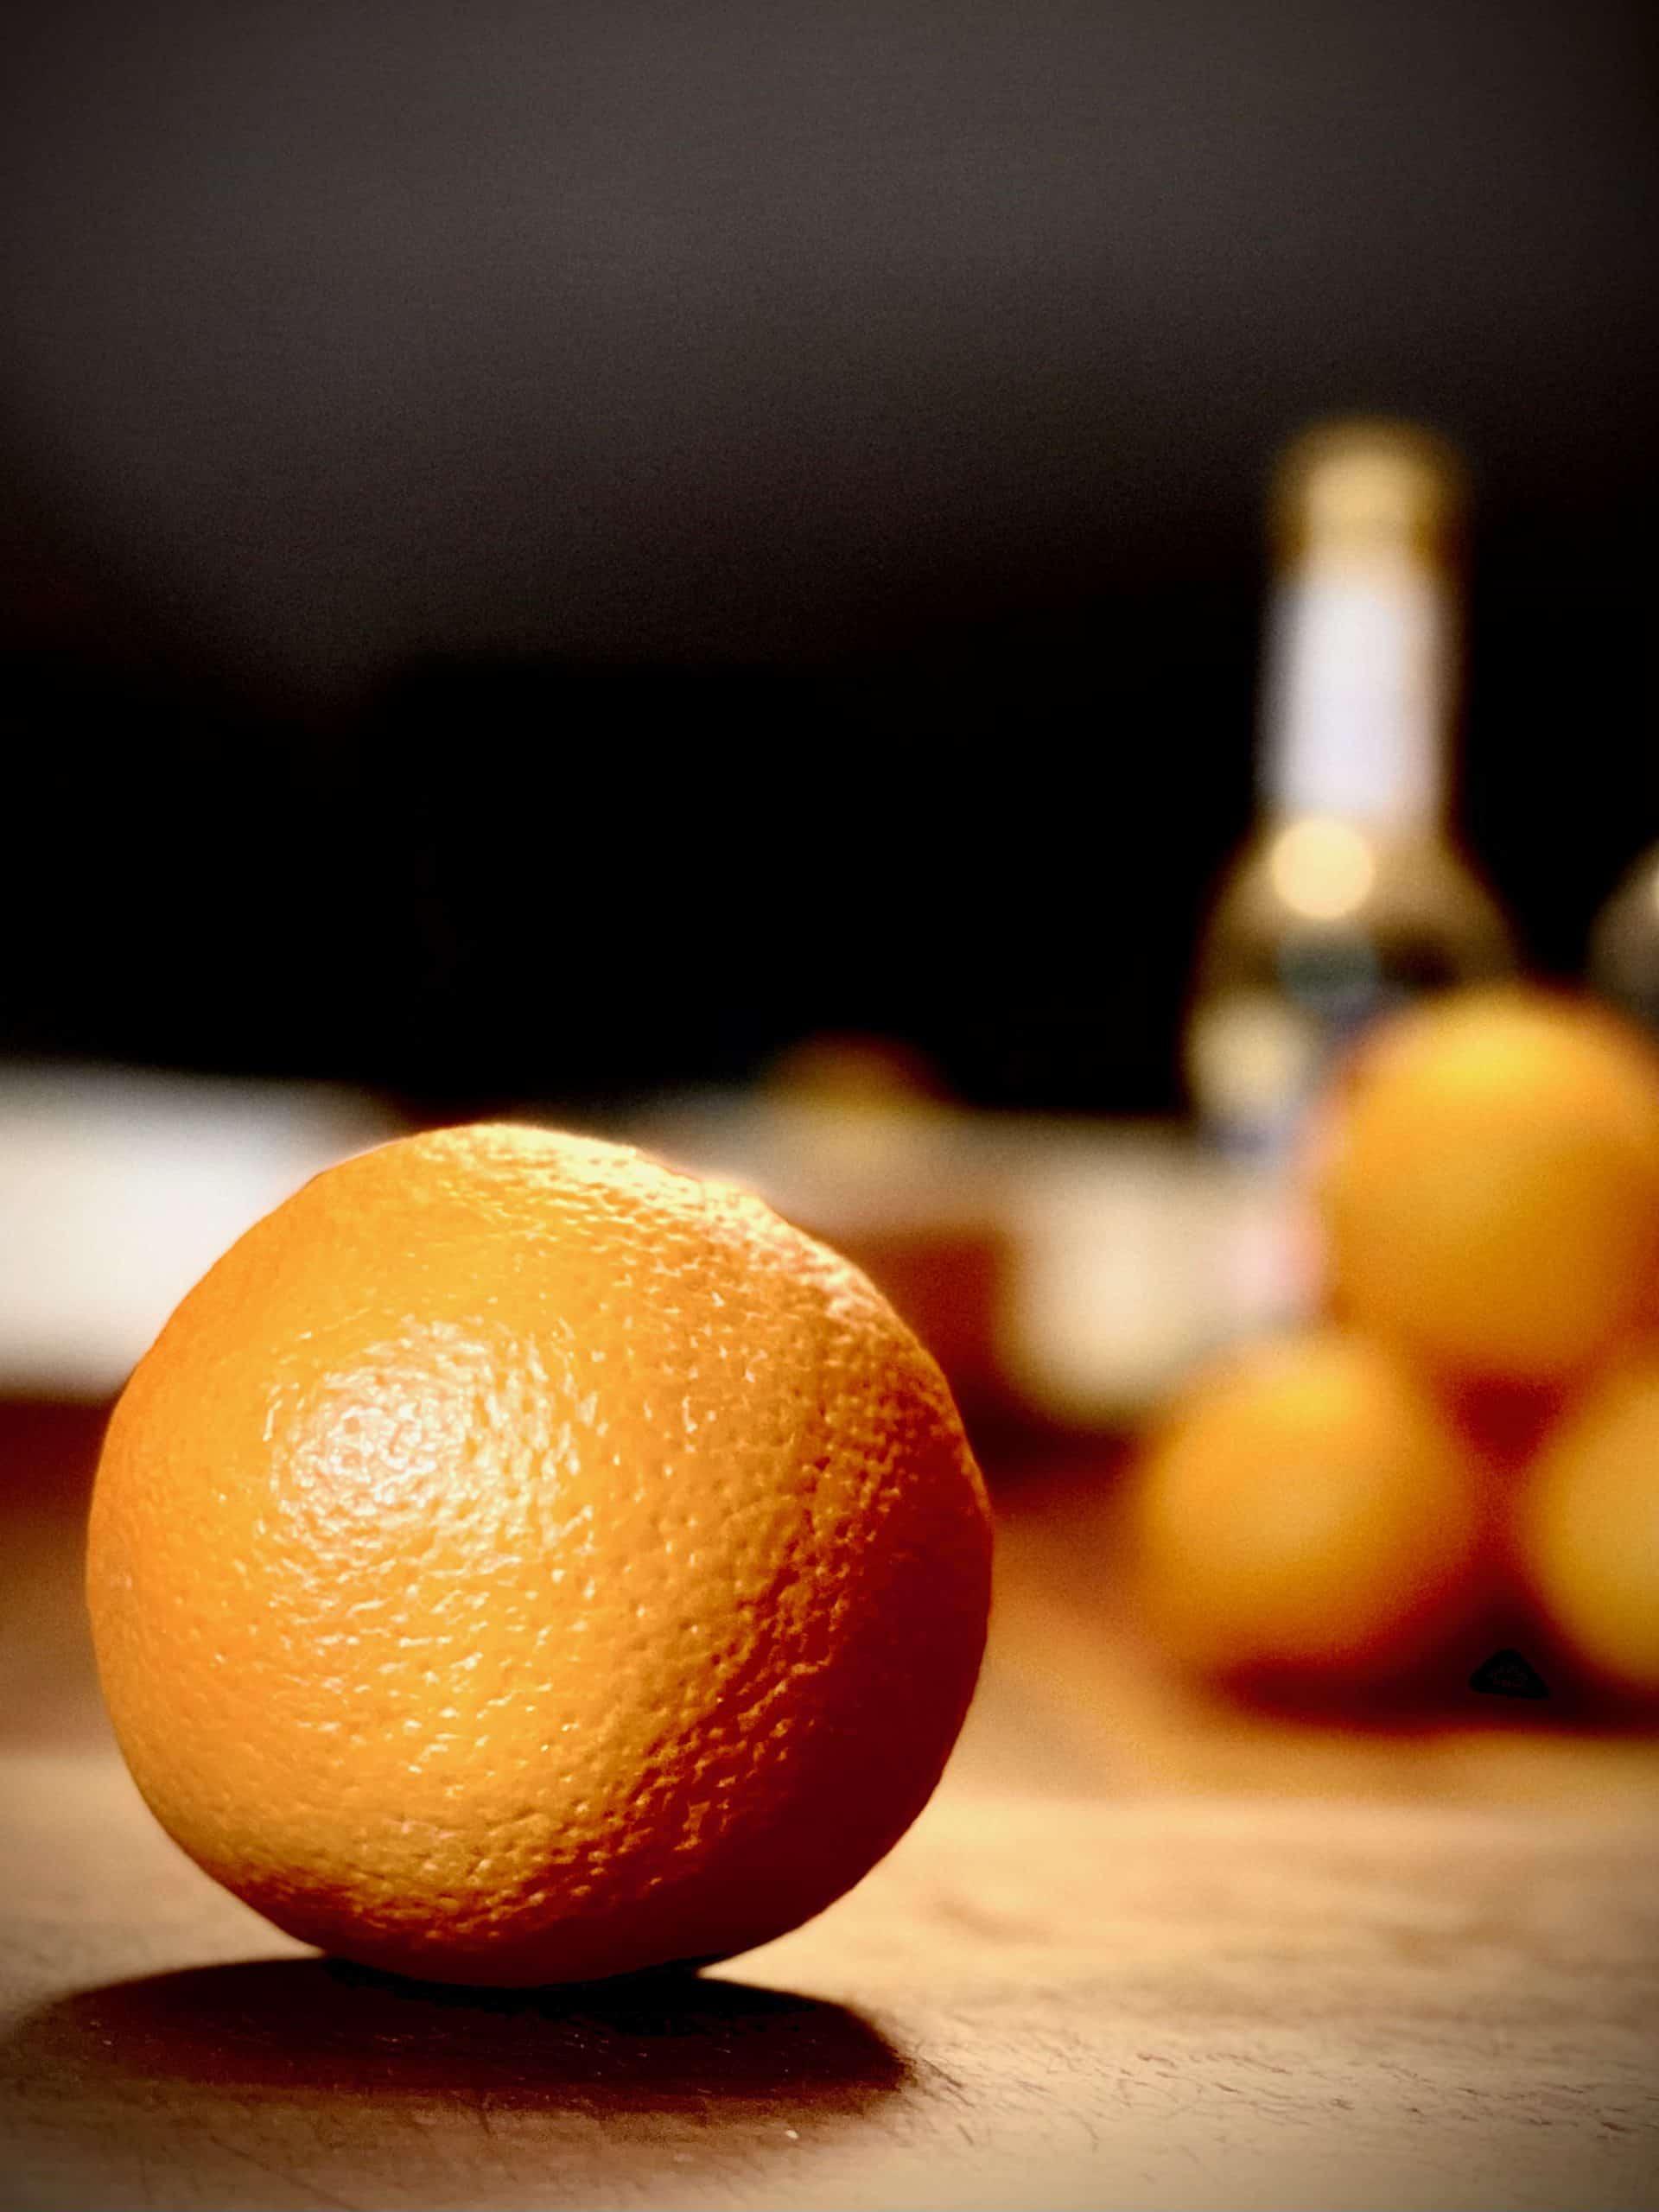 Selecting Oranges